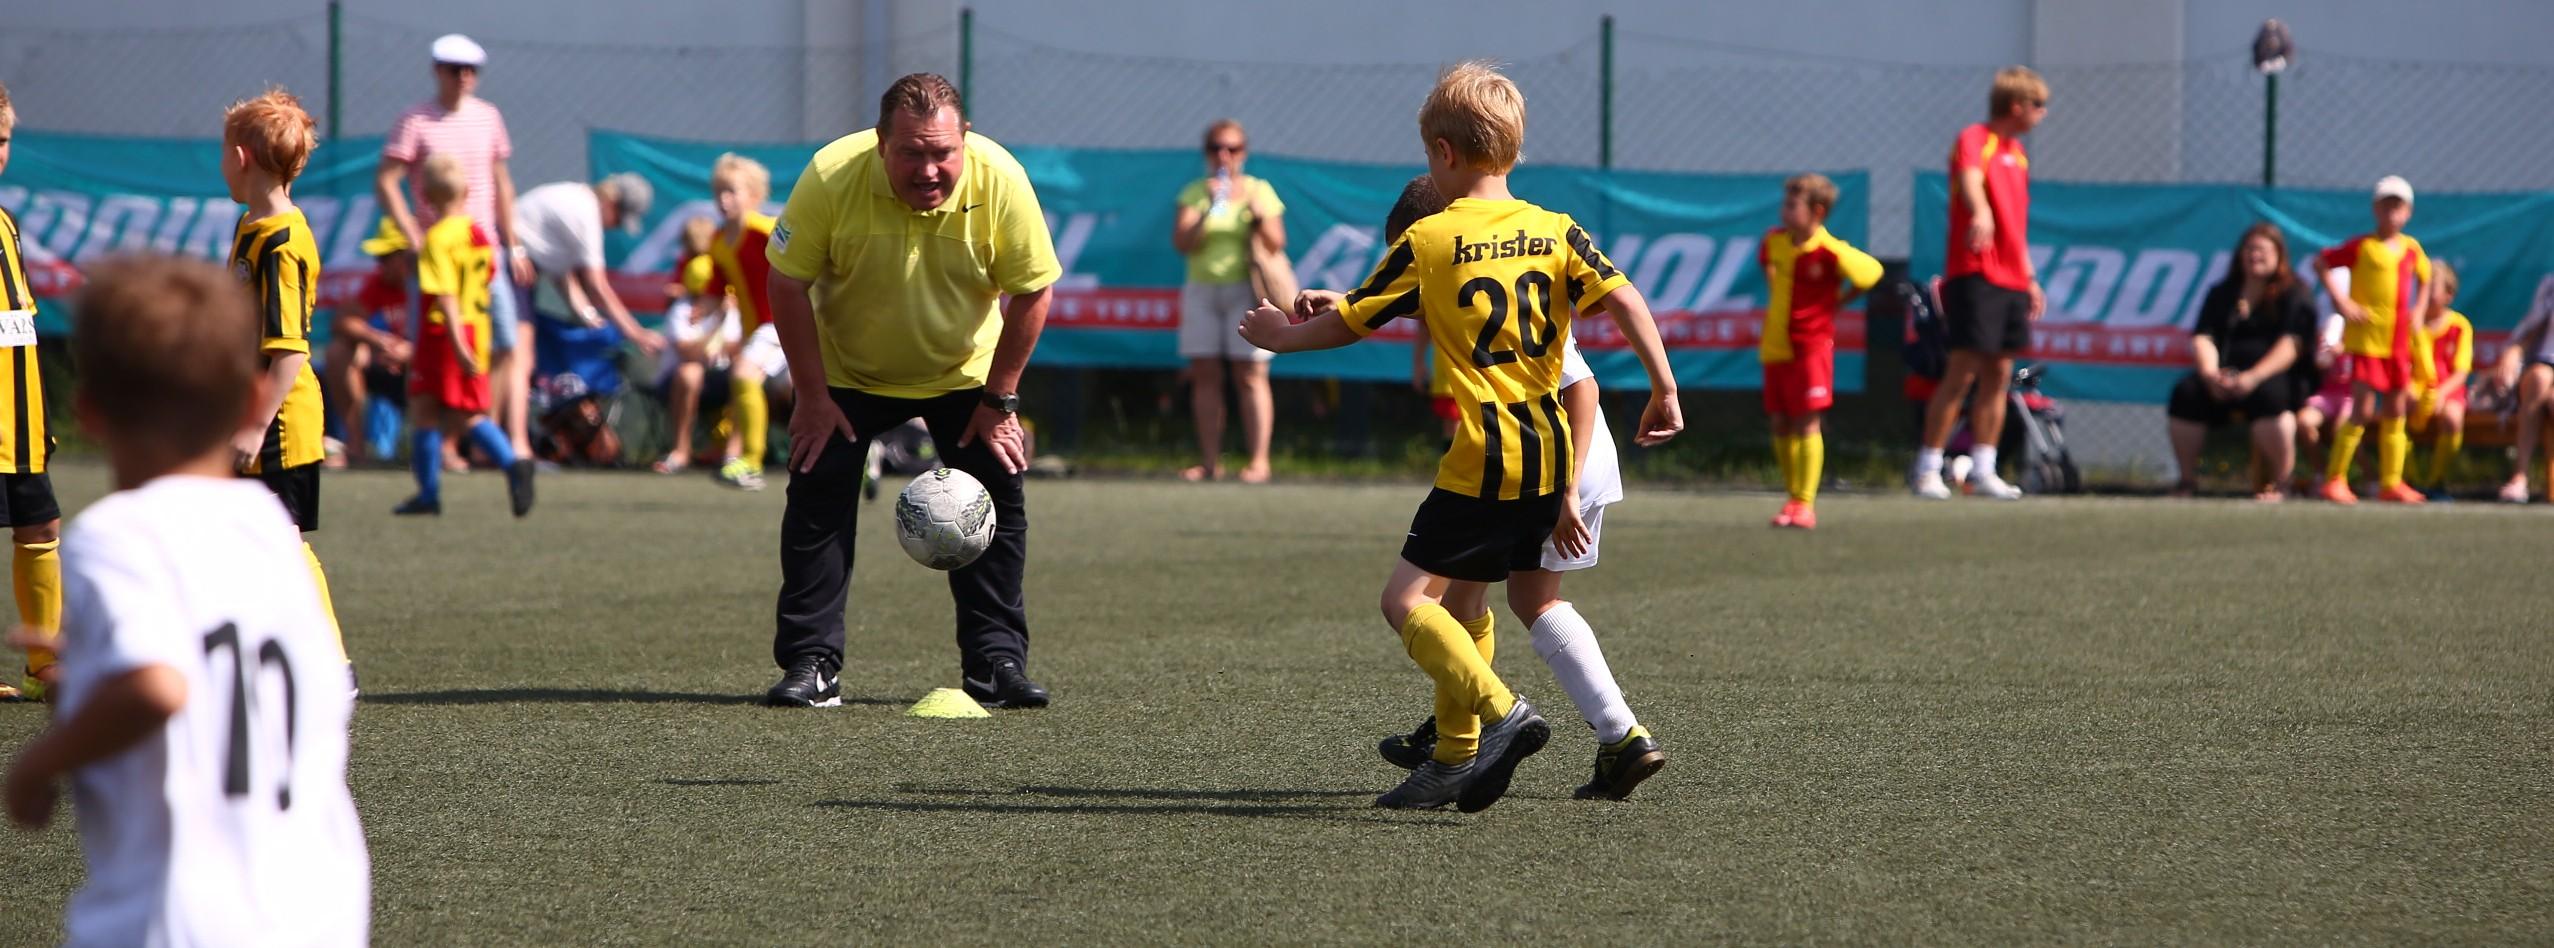 Lootosspring2013_AddinolCUP (23)